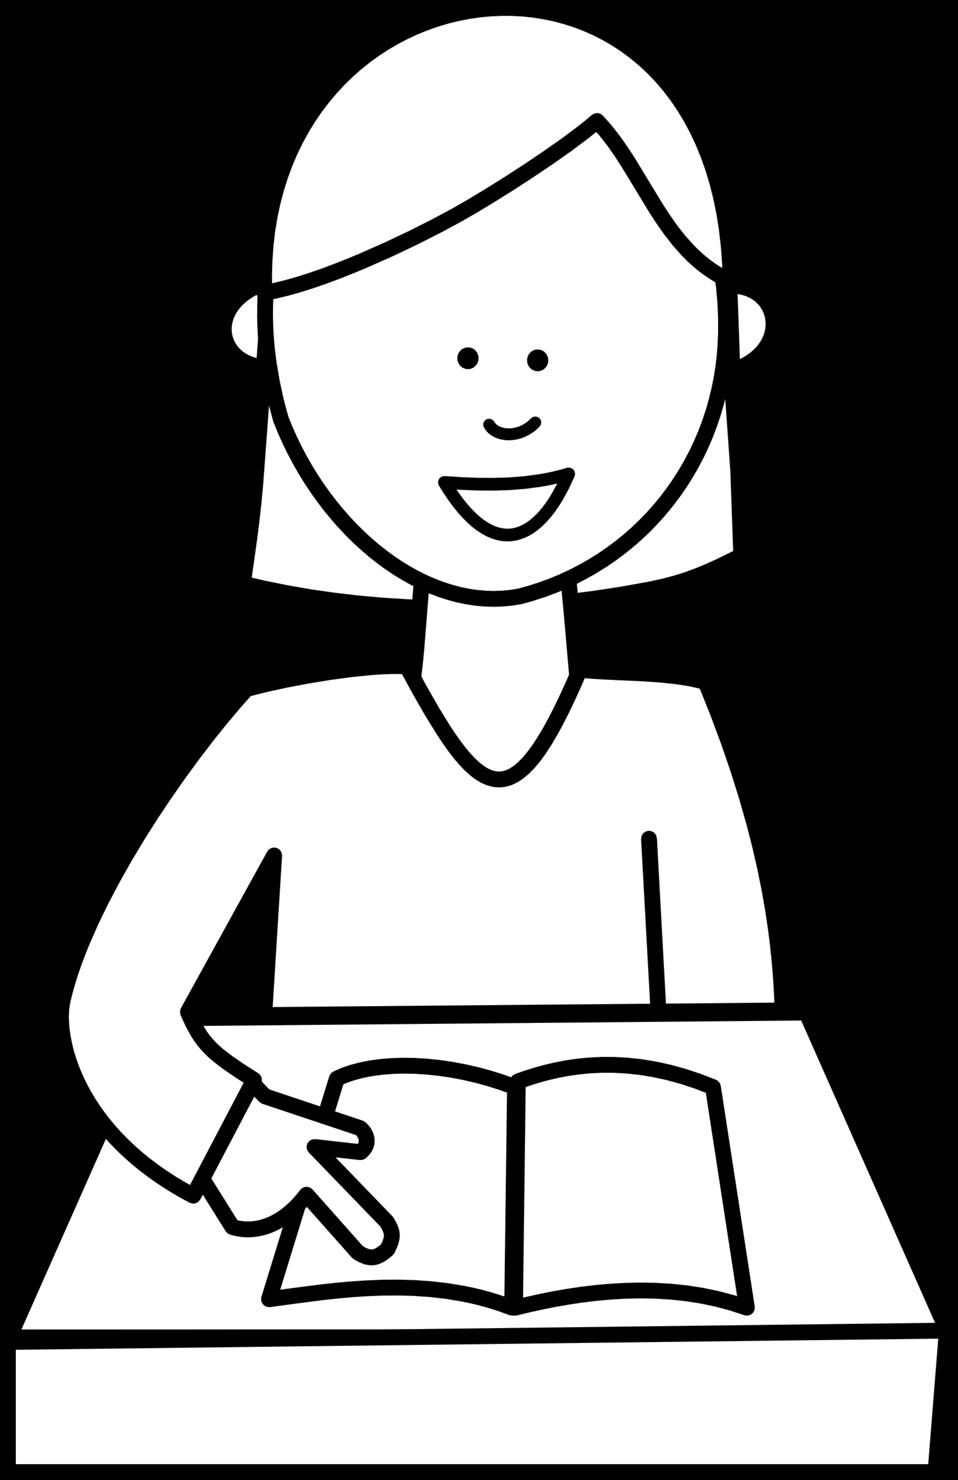 Drawing clipart student. Public domain clip art